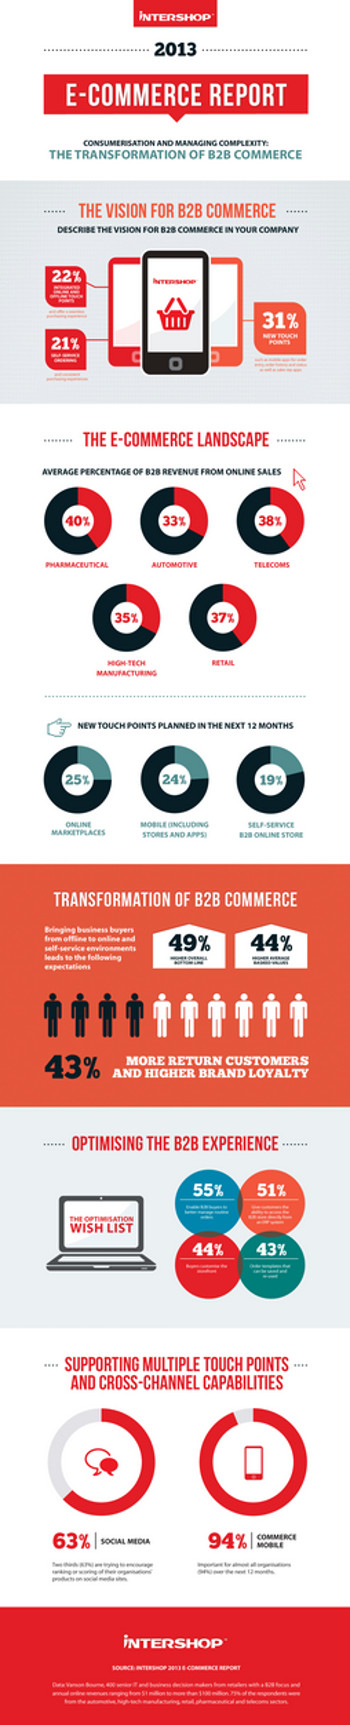 infographie e-commerce